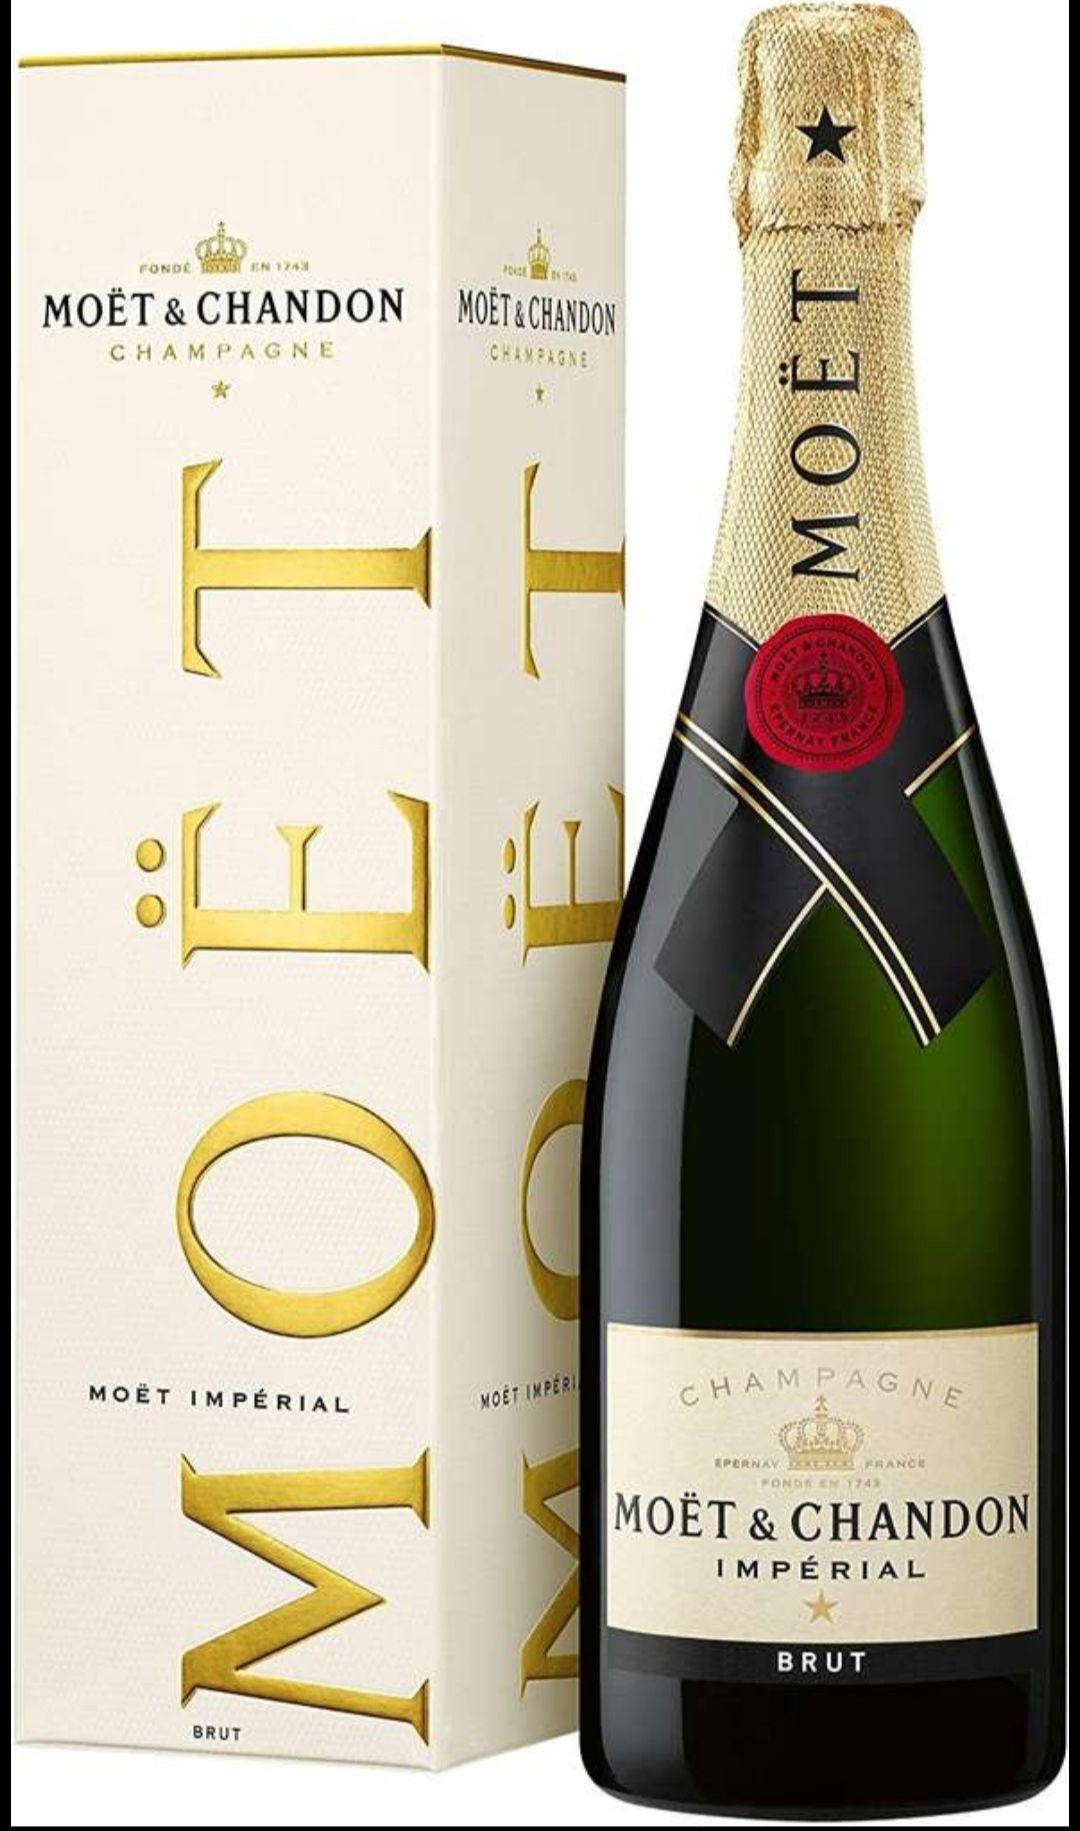 Moët & Chandon Impérial Brut, Gift Box 75 cl - £29 @ ASDA